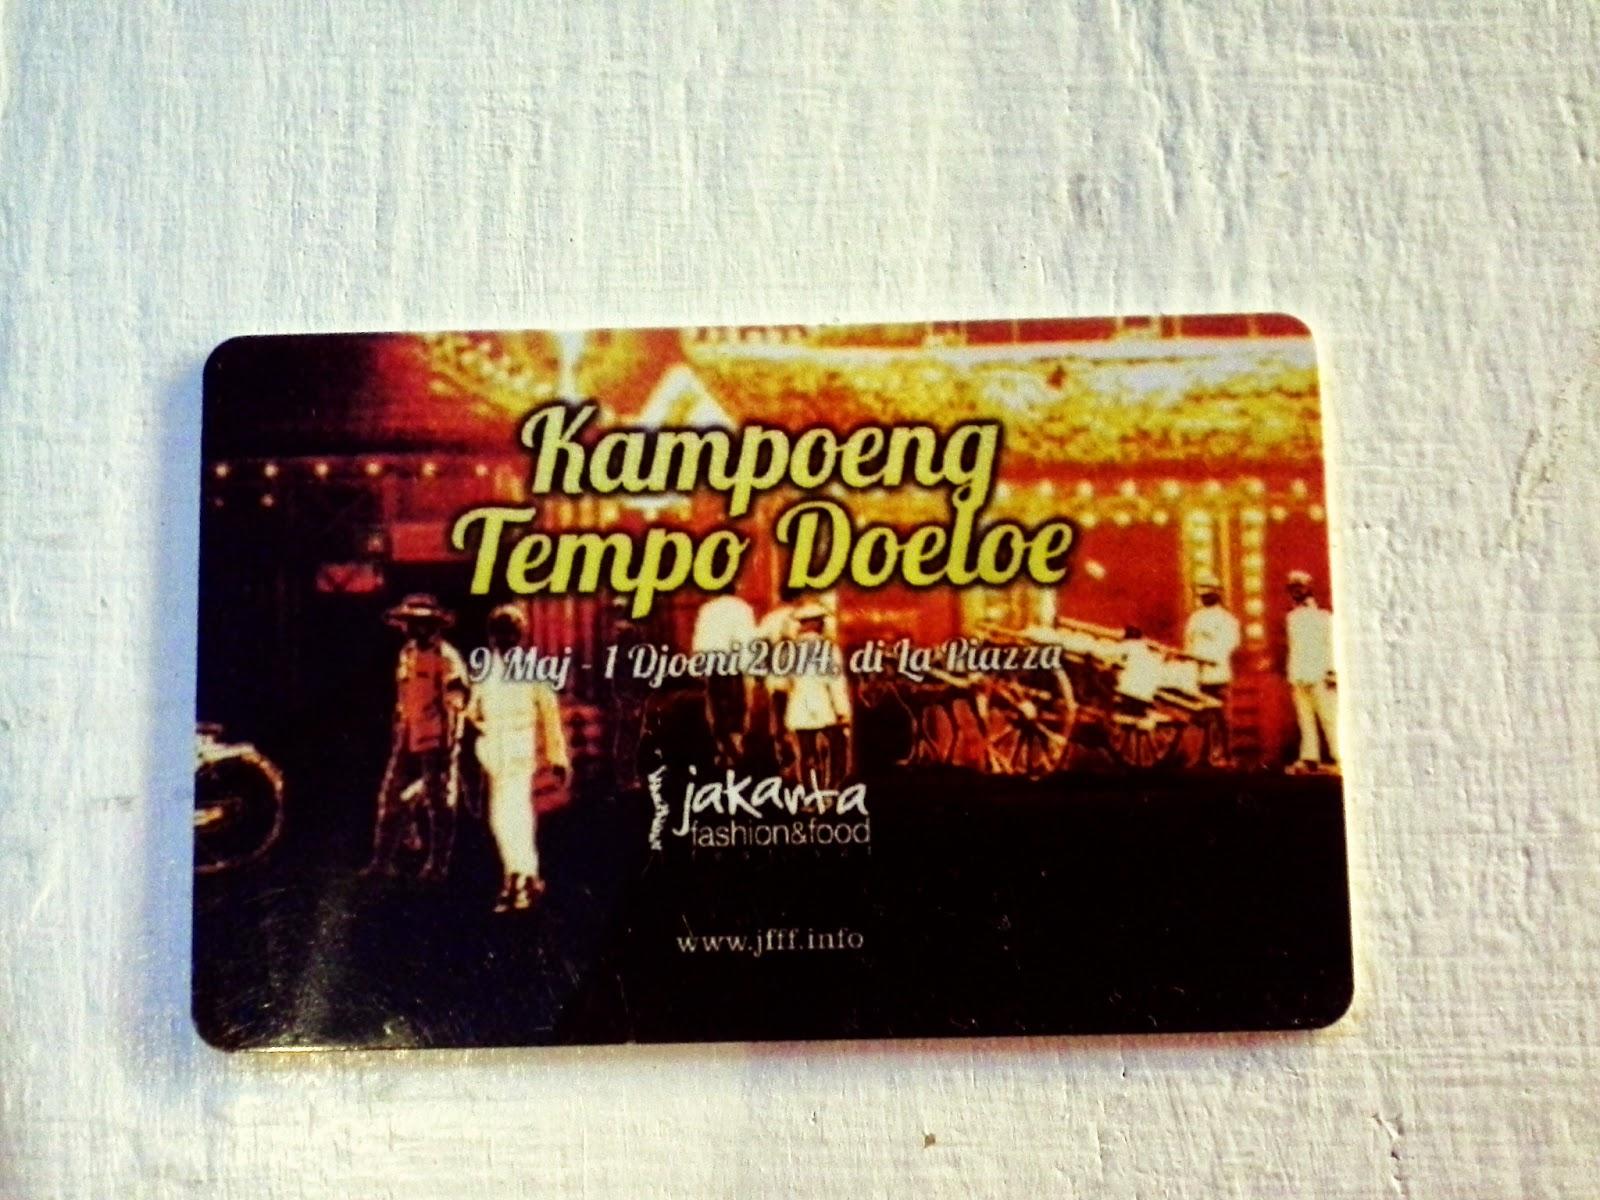 Nanad Land Kampoeng Tempo Doeloe Mall Kelapa Gading Iya Kan Bener Eh Tu Cuma Sampe 1 Juni Ya Acaranya Baru Ngeh Pas Liat Foto Kartu Depositnya D